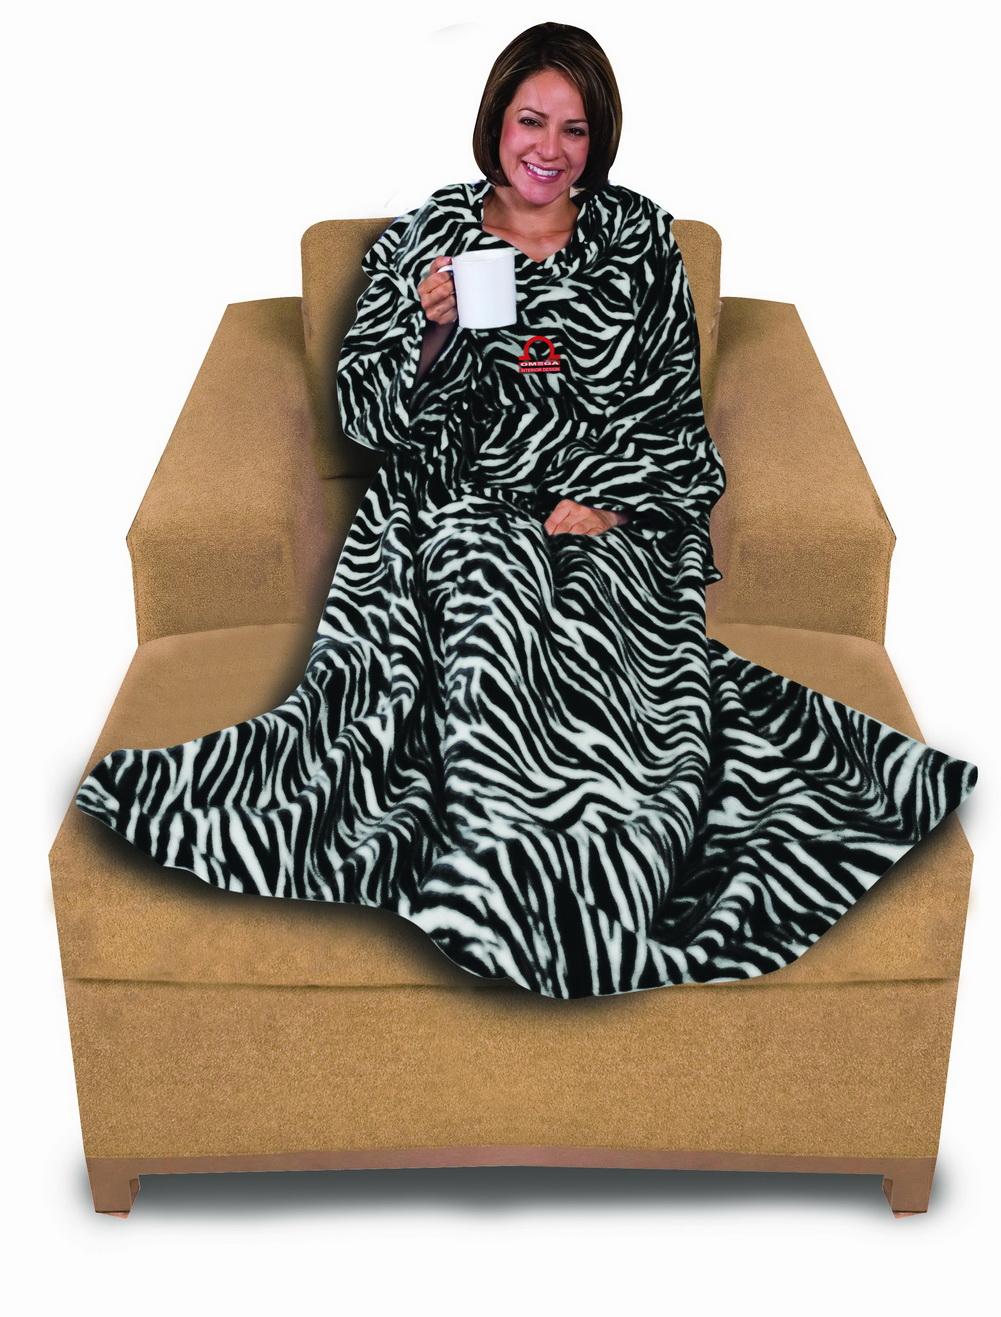 Napa 174 Deluxe Polar Fleece Home Snuggie Robe Cloak Towel